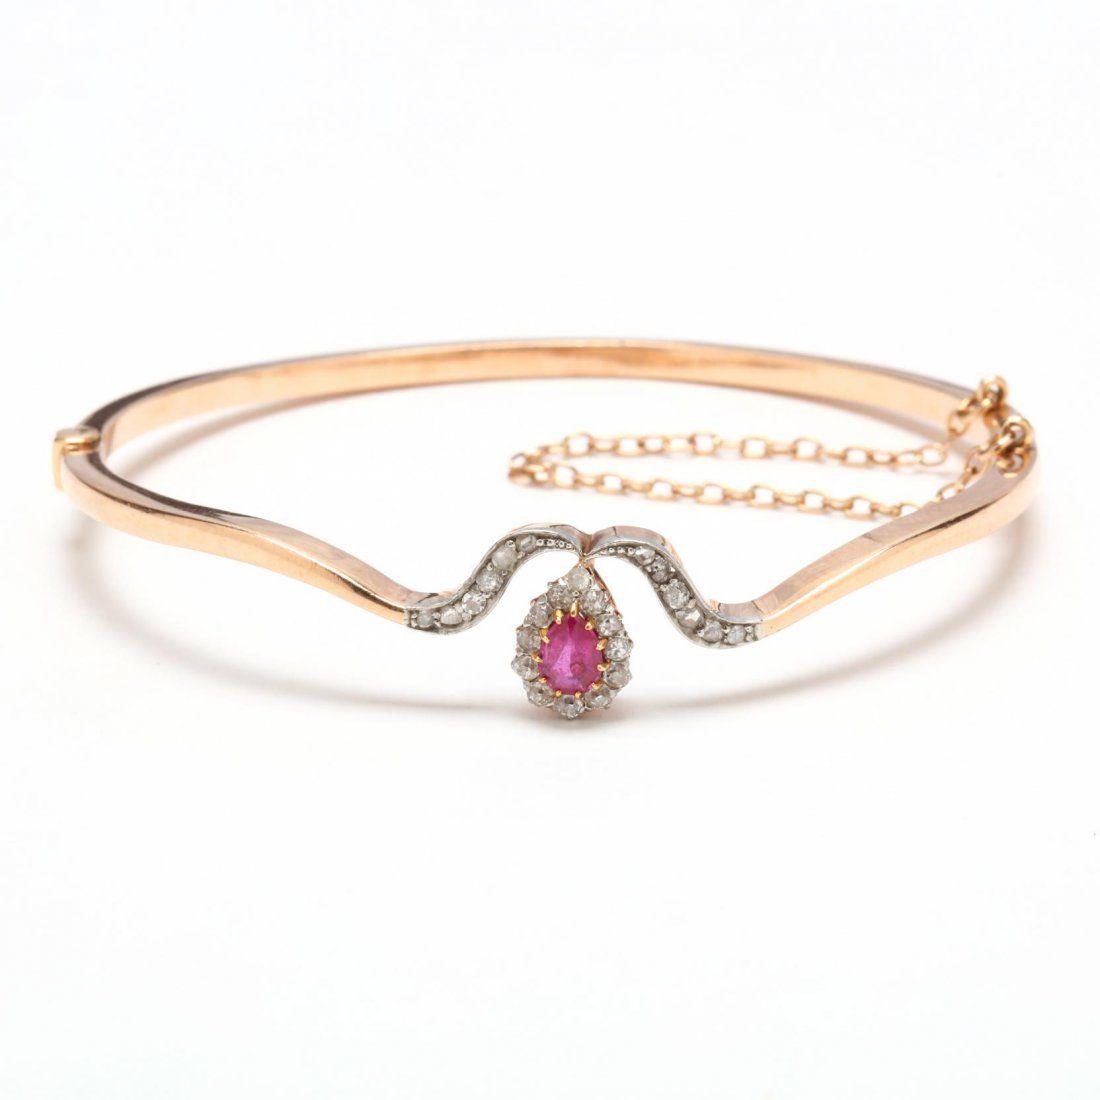 Antique 14KT Pink Sapphire and Diamond Bracelet